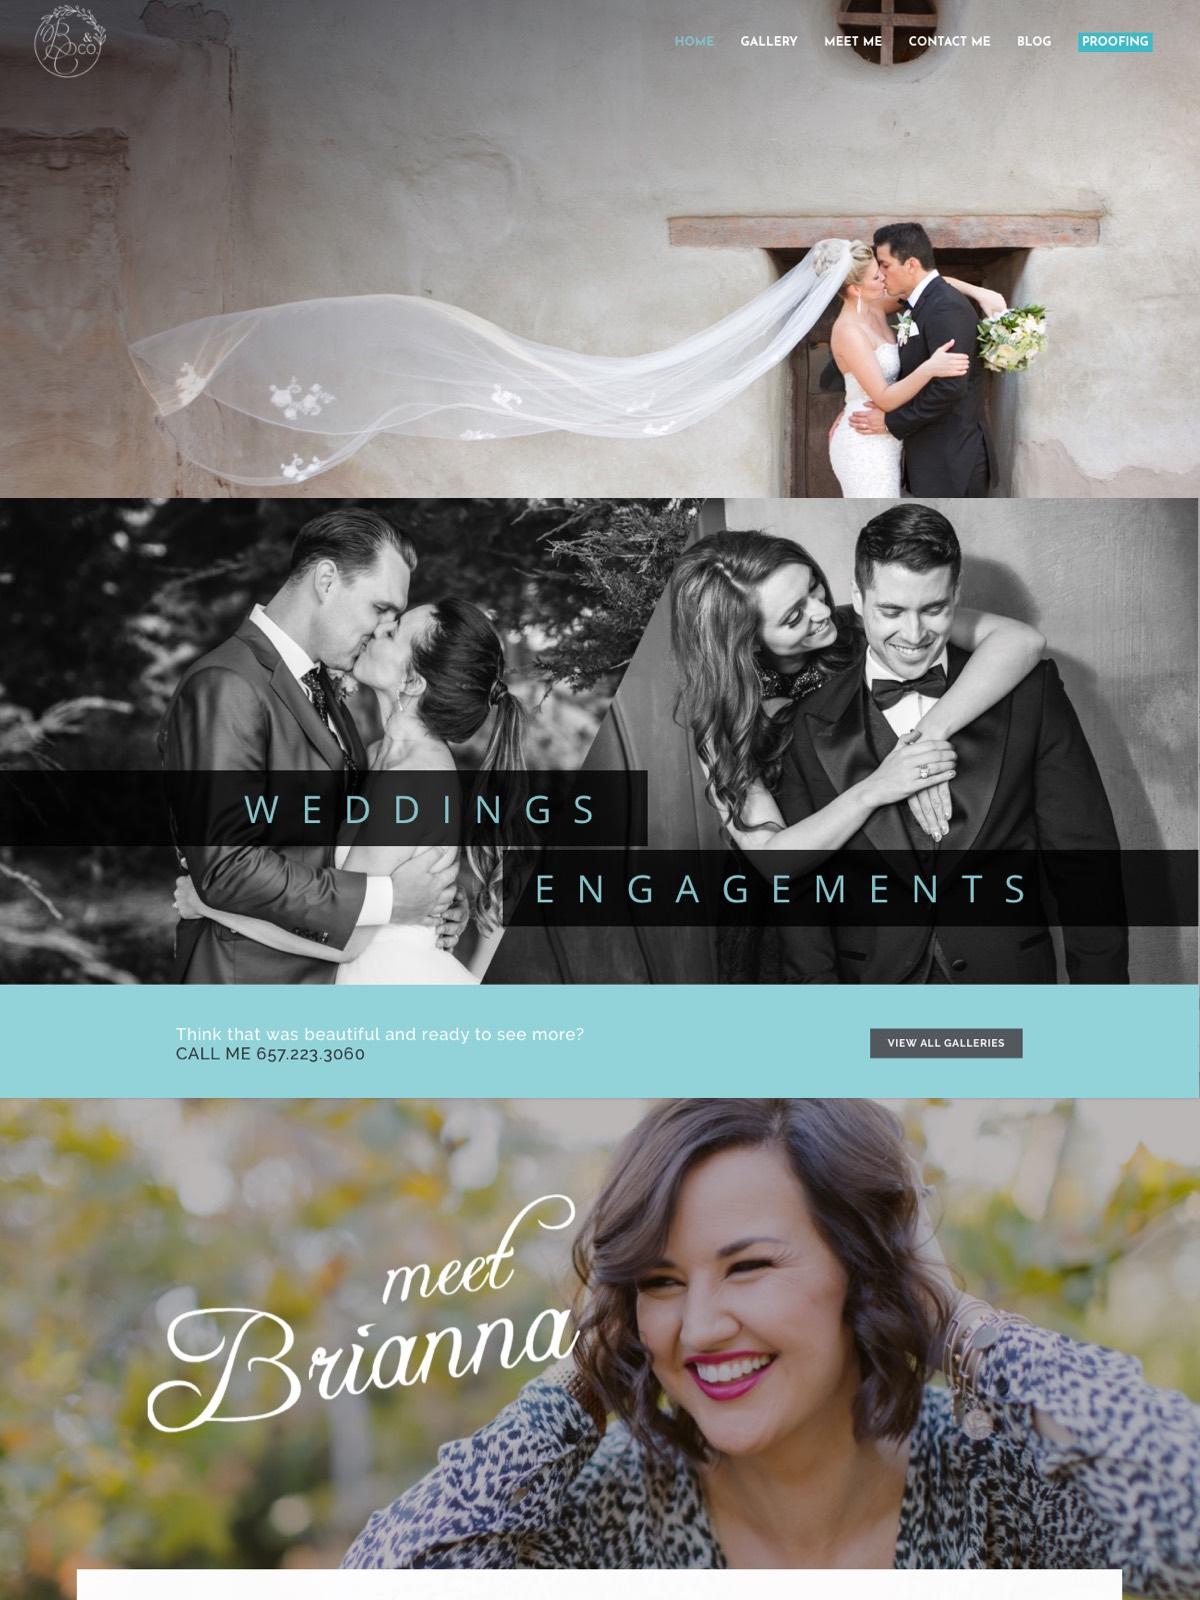 Orange County Website Design Company Brianna Caster Wedding Photographer Marketing Seo